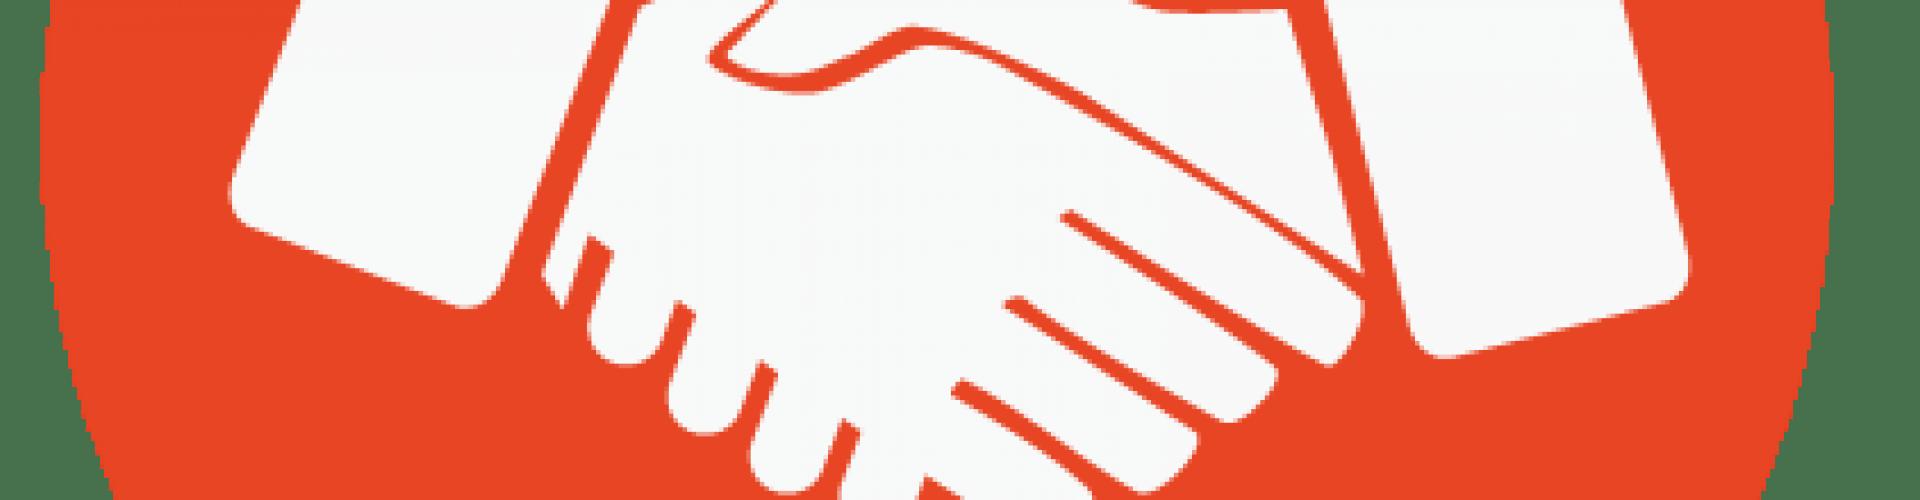 Cropped png fake id. Handshake clipart orange